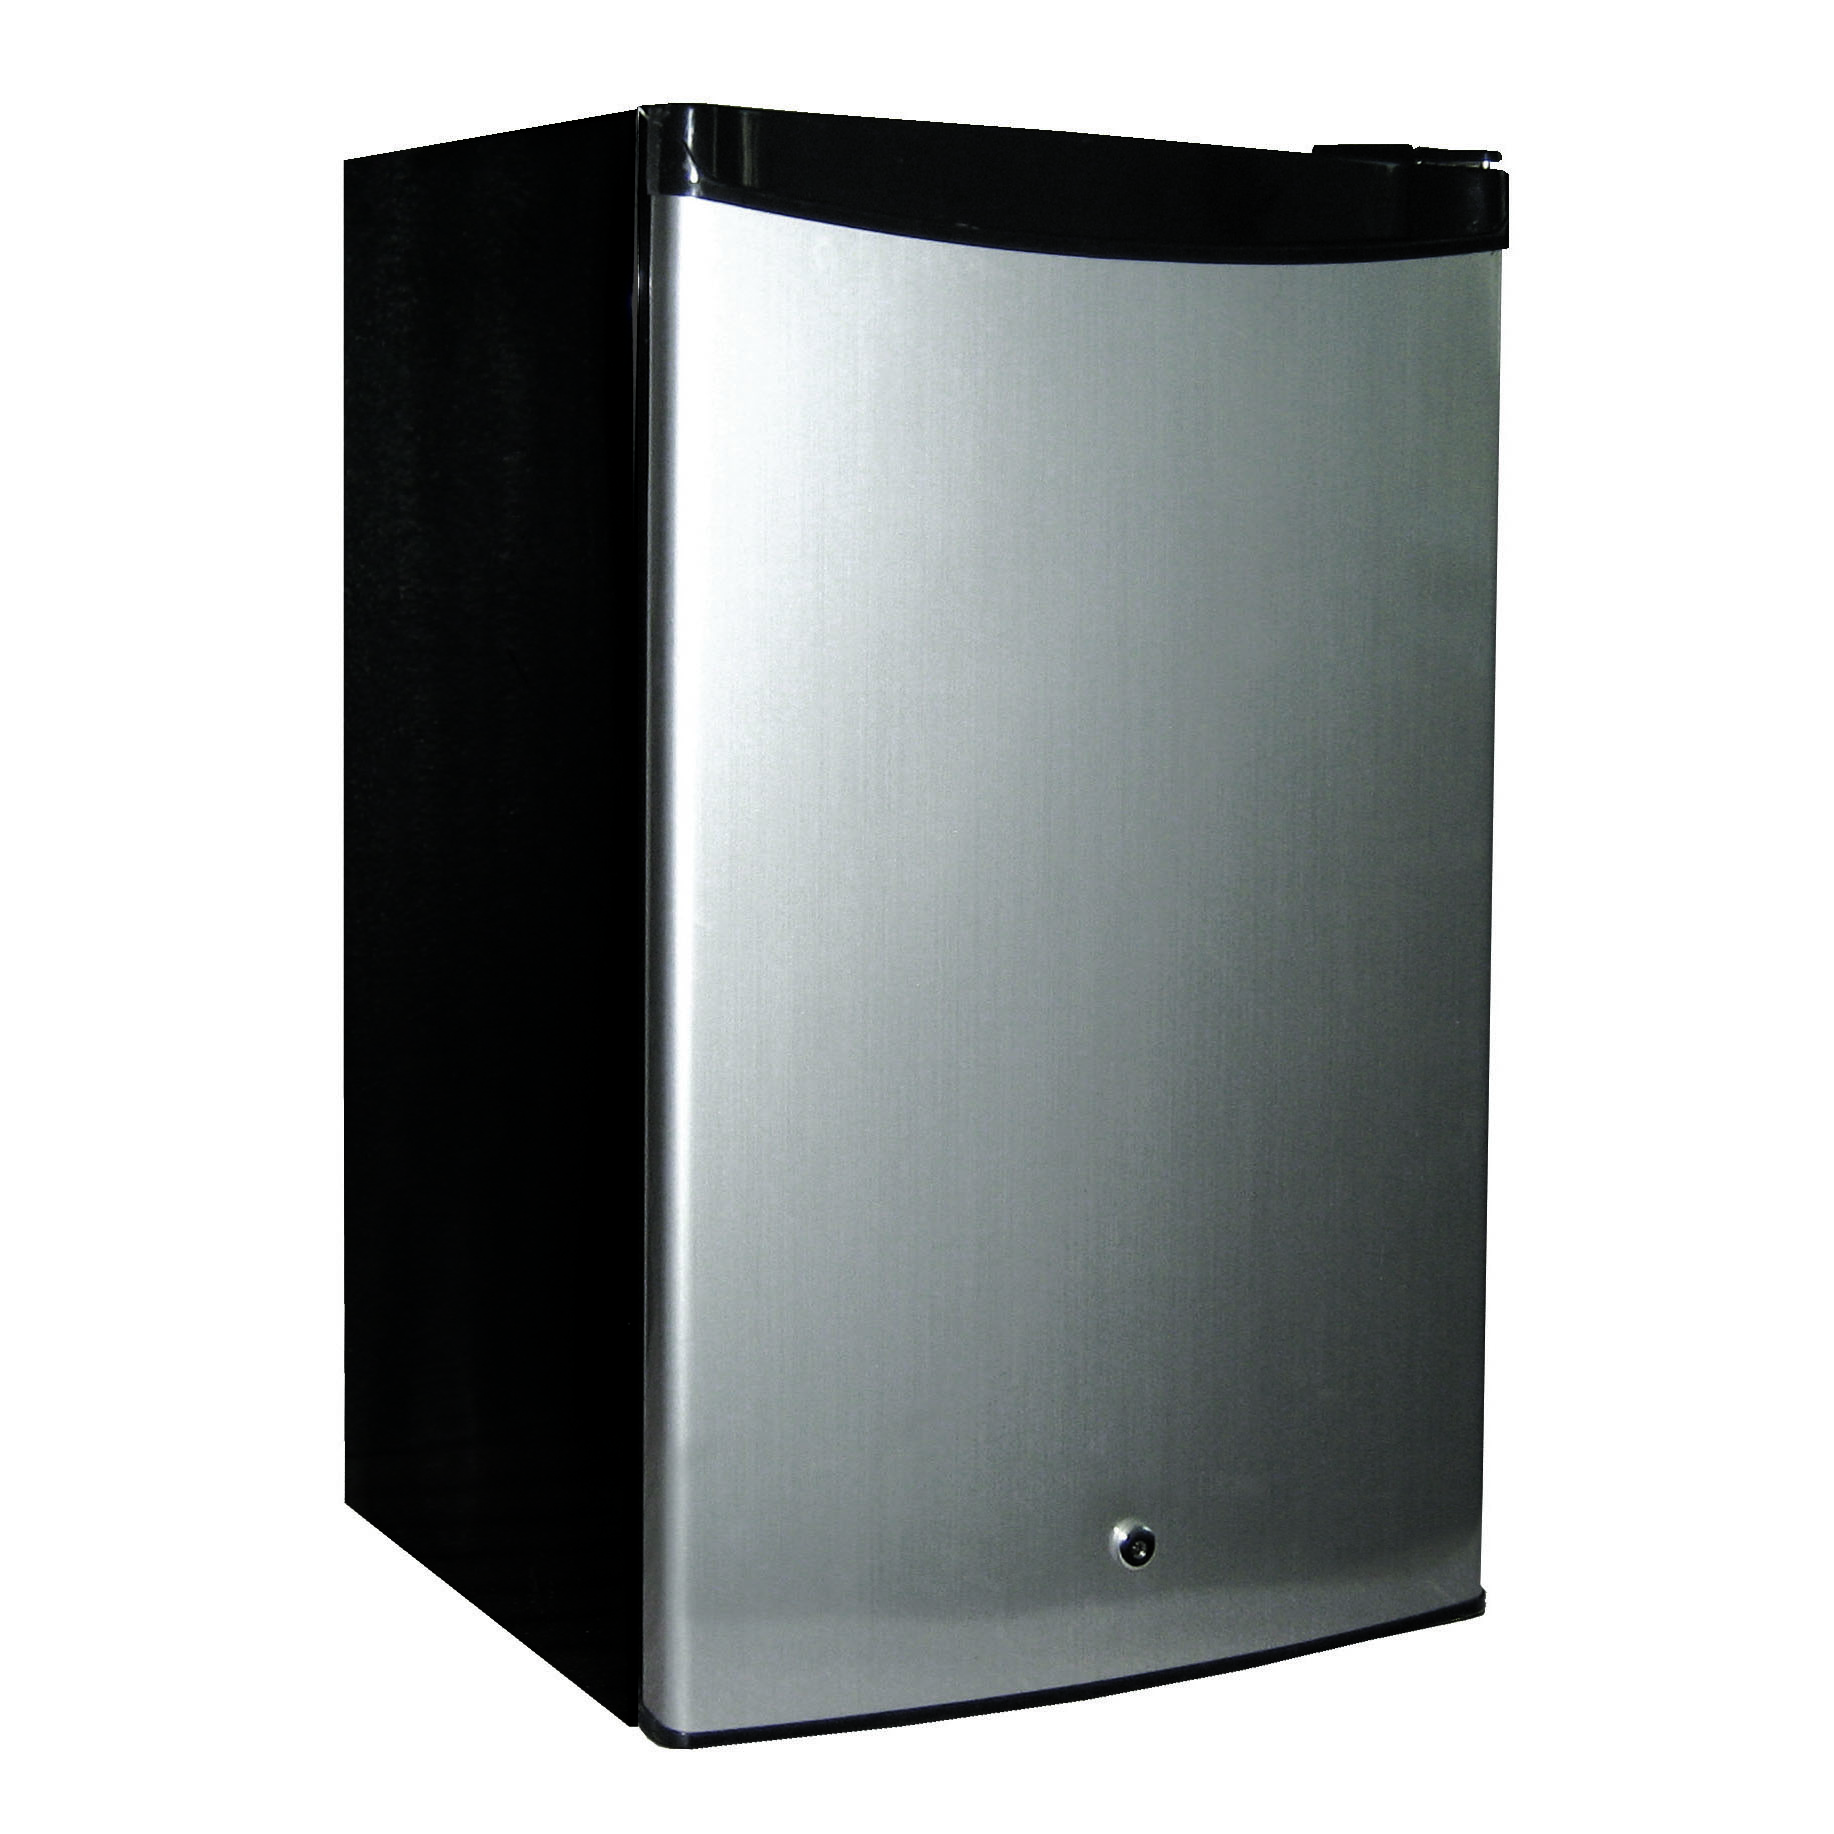 Refrigerator Outdoor Summerset Outdoor Refrigerator With Lock Stainless Steel Low